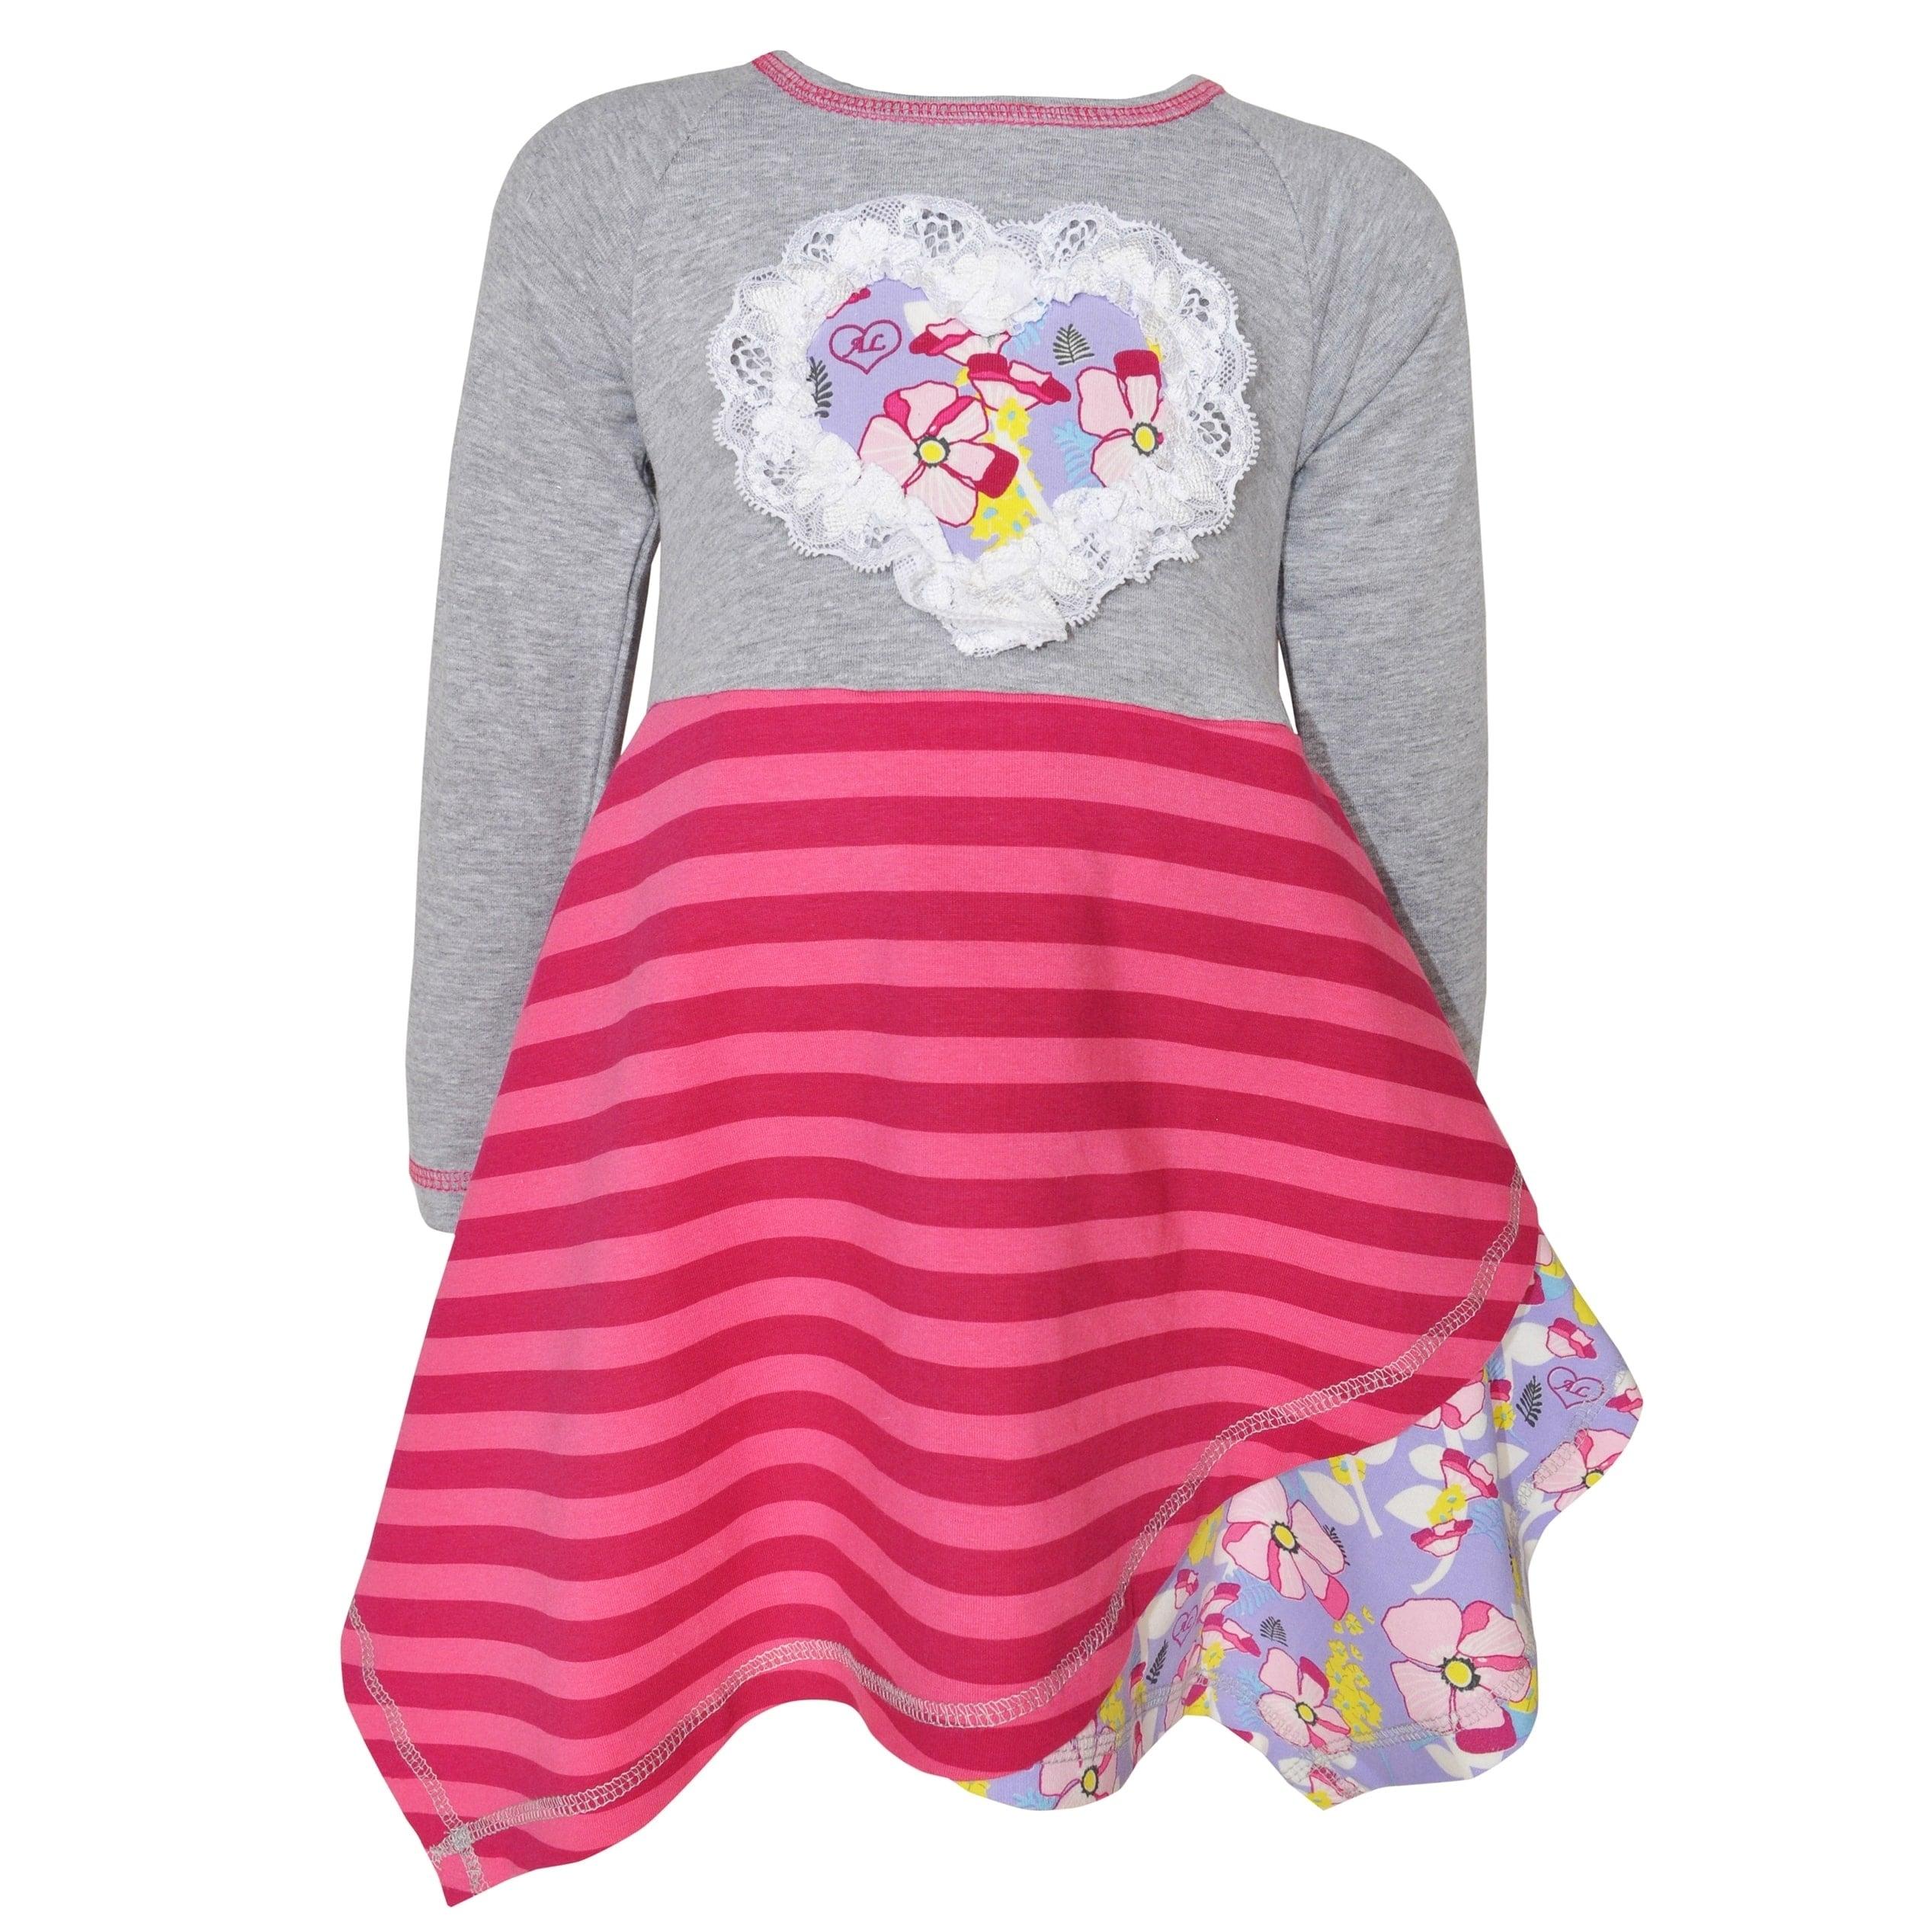 AnnLoren AnnLoren Girl's Boutique Grey/Pink/Purple/Yellow...